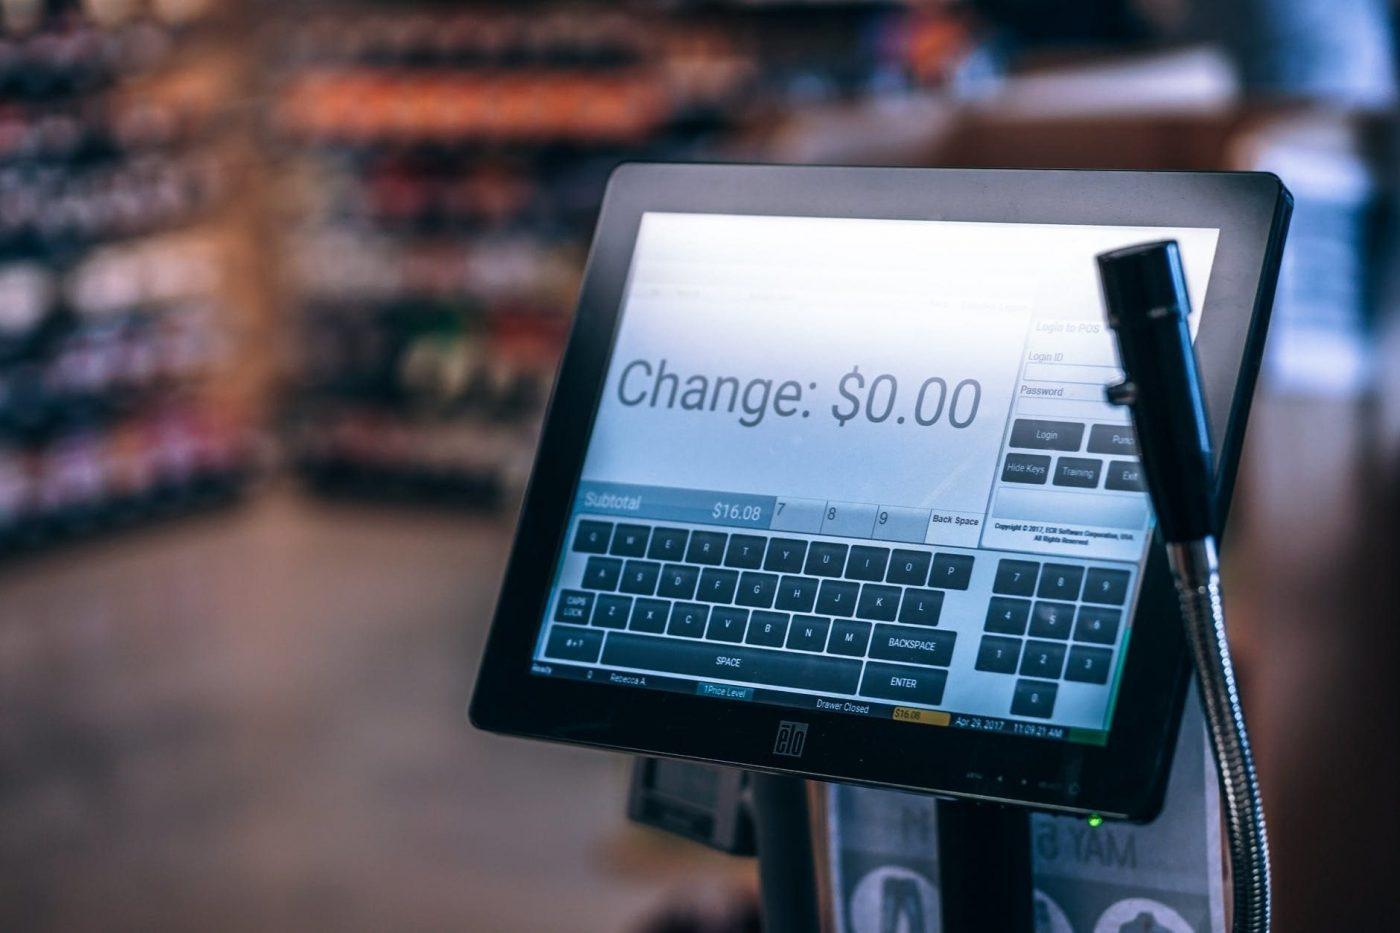 Cashierless checkout